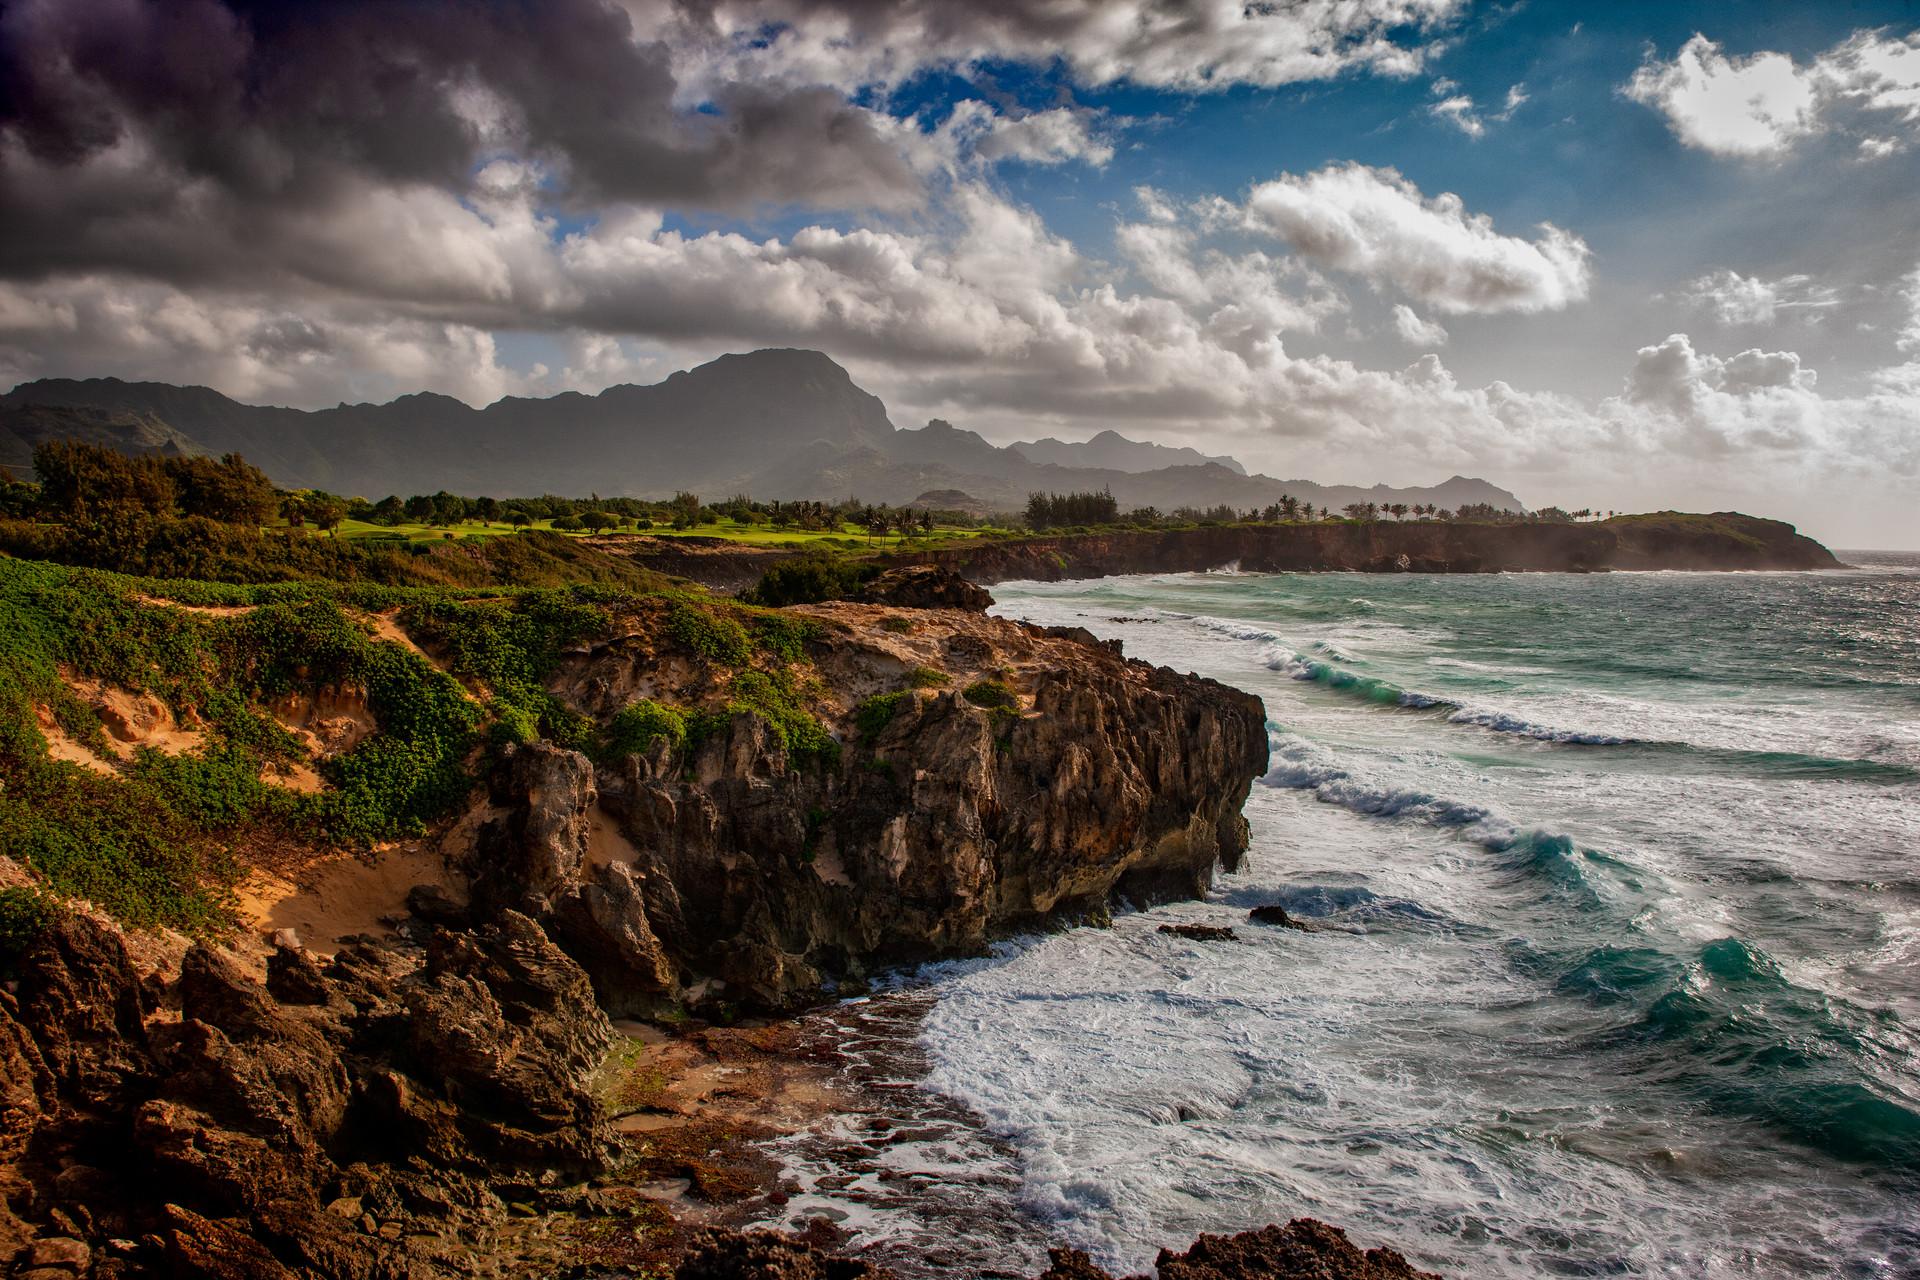 Kauai Clouds